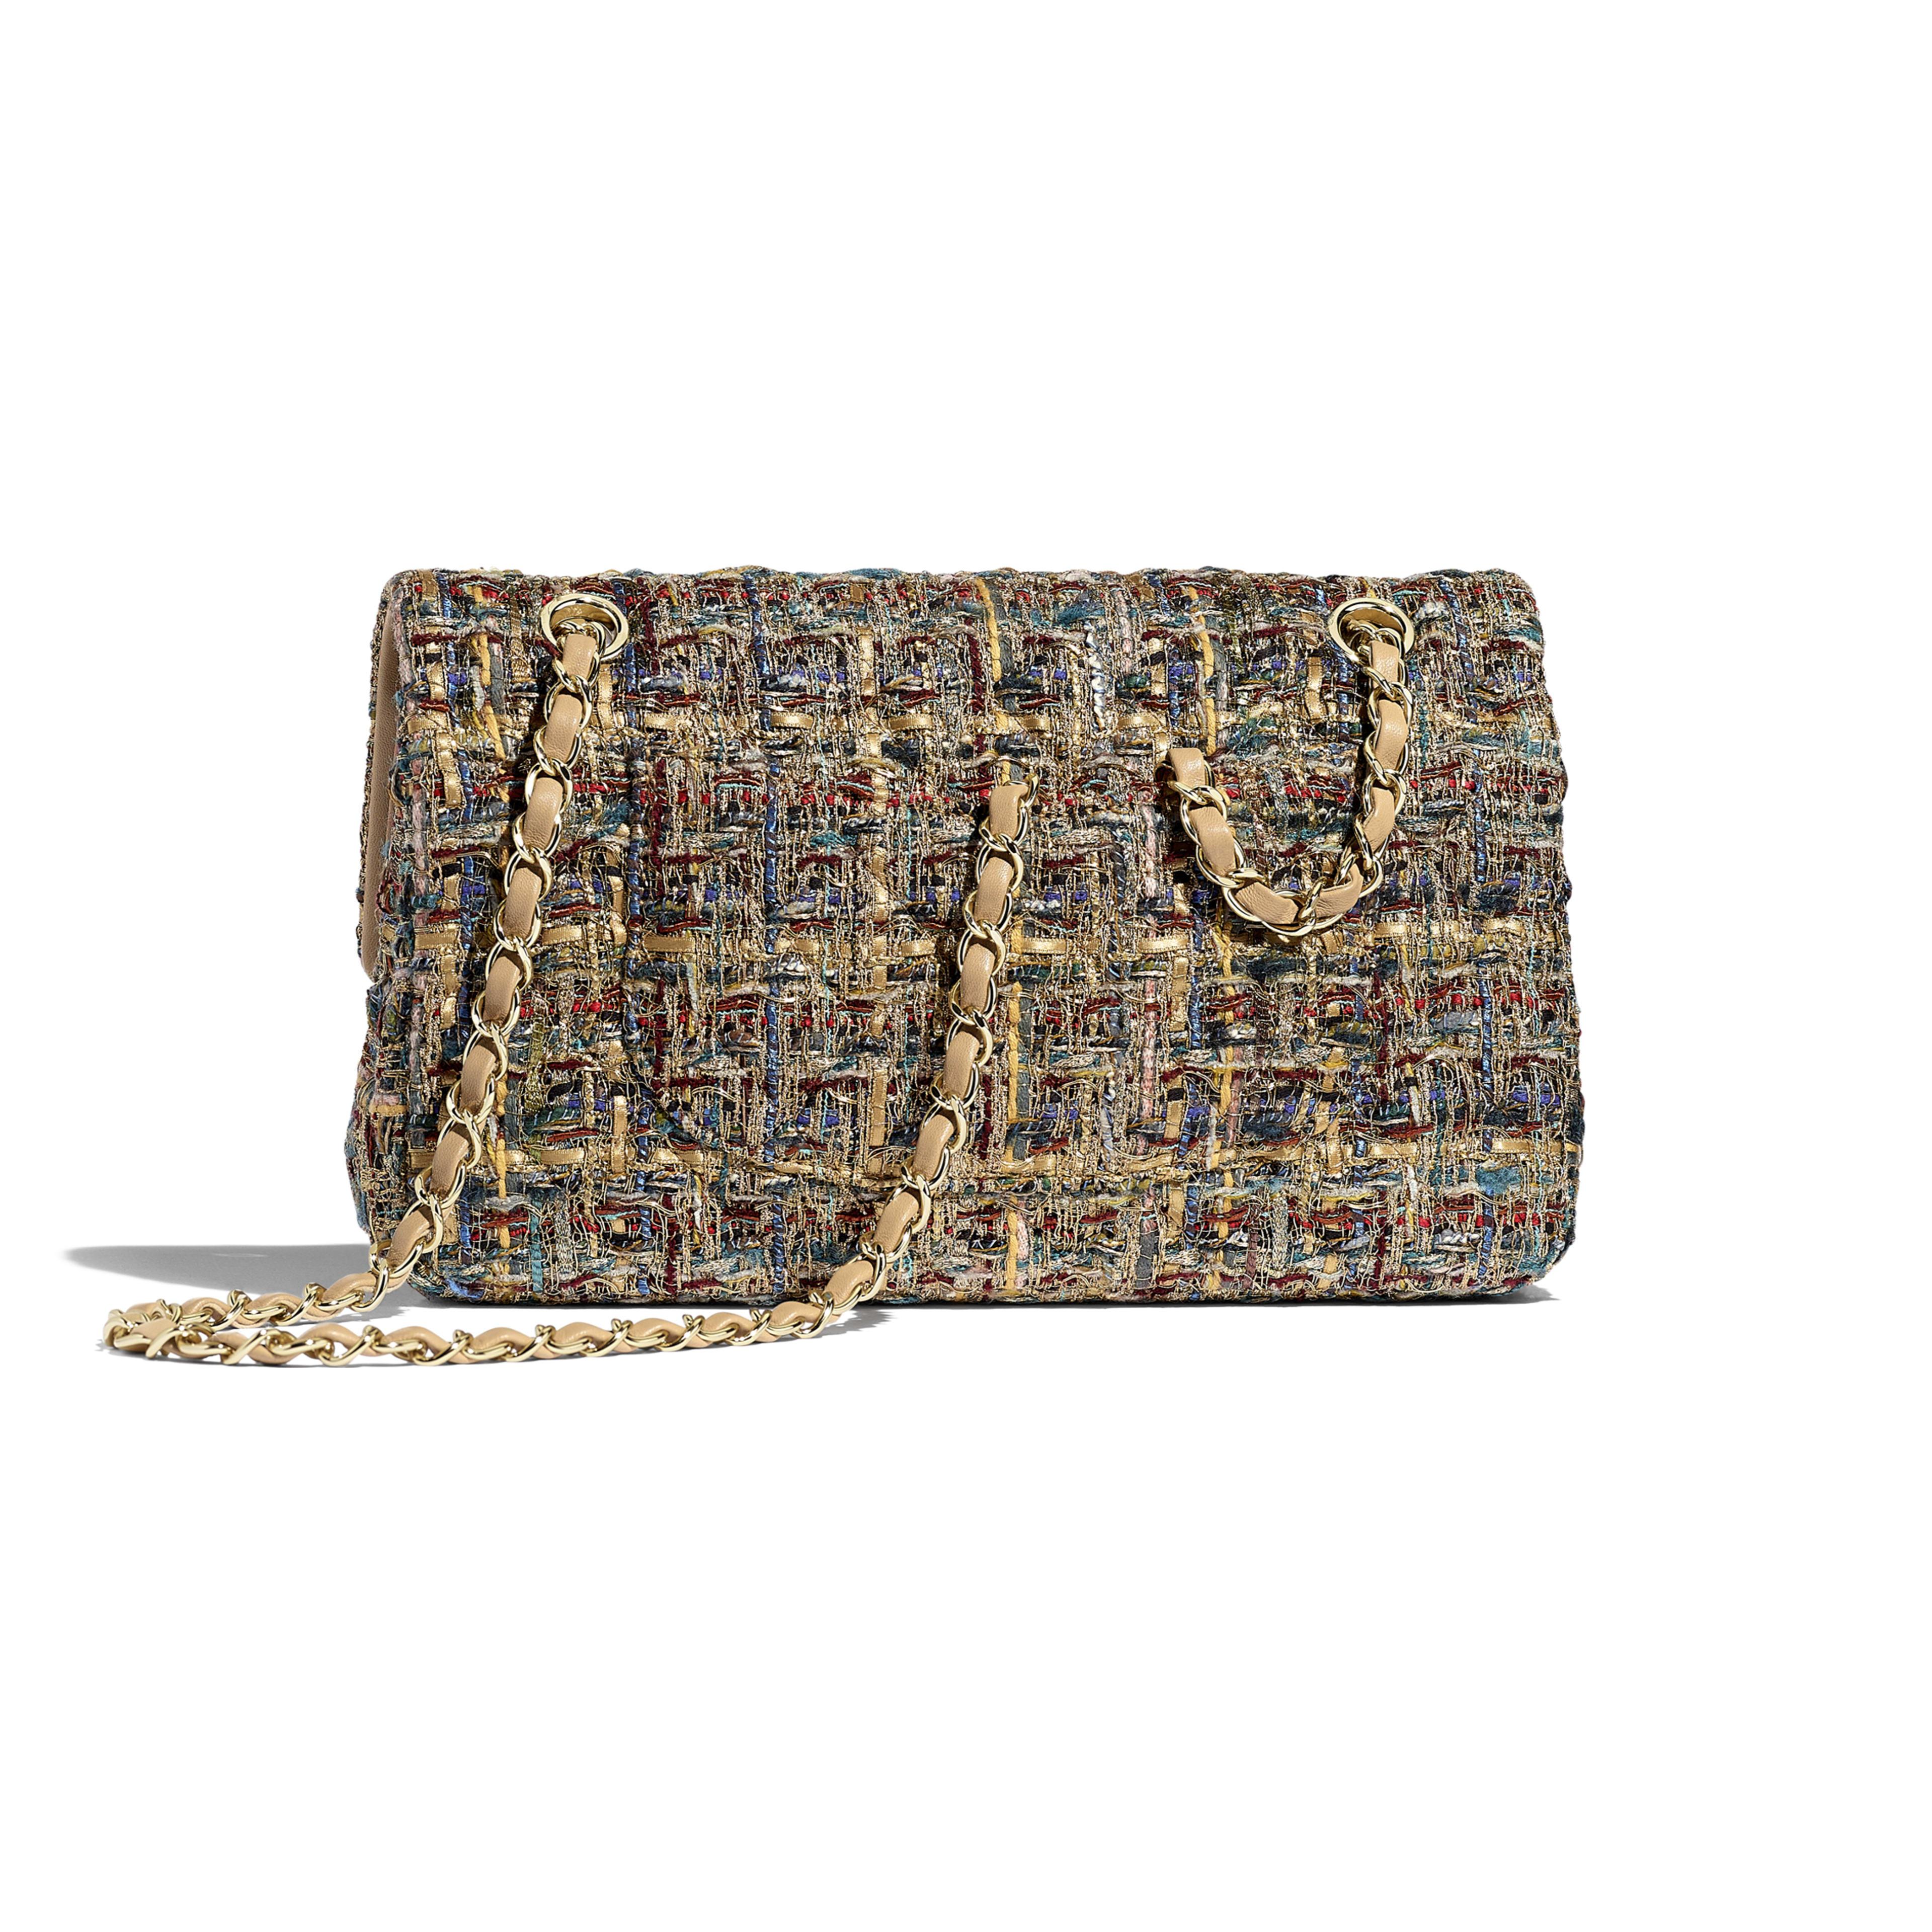 Classic Handbag - Gold, Blue & Green - Tweed & Gold-Tone Metal - Alternative view - see full sized version